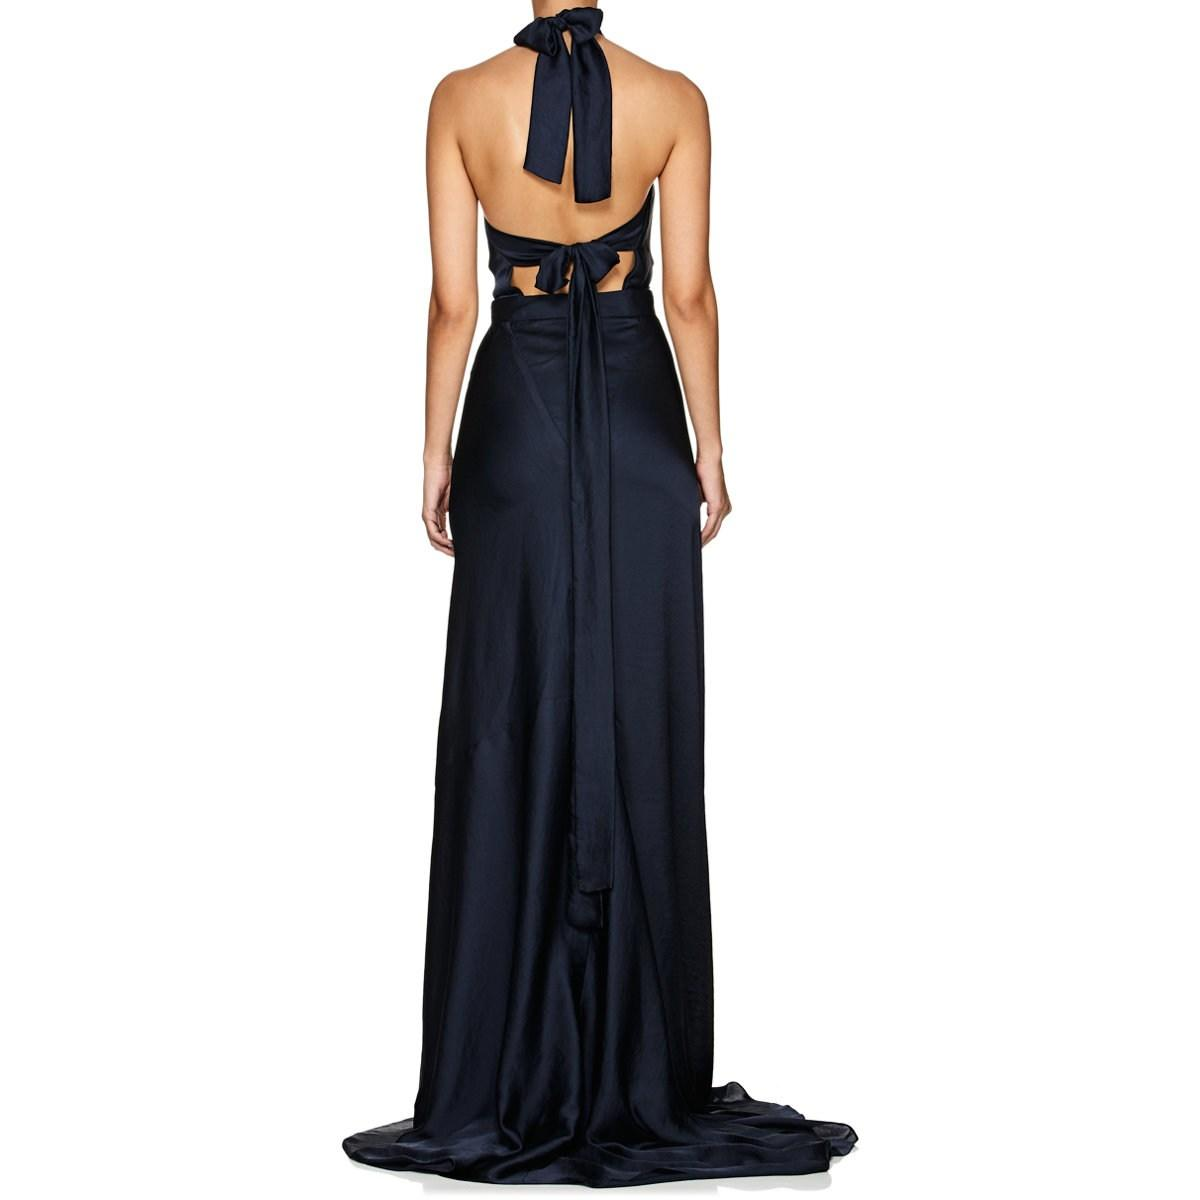 241913018f98 Juan Carlos Obando Satin Halter Gown in Blue - Lyst